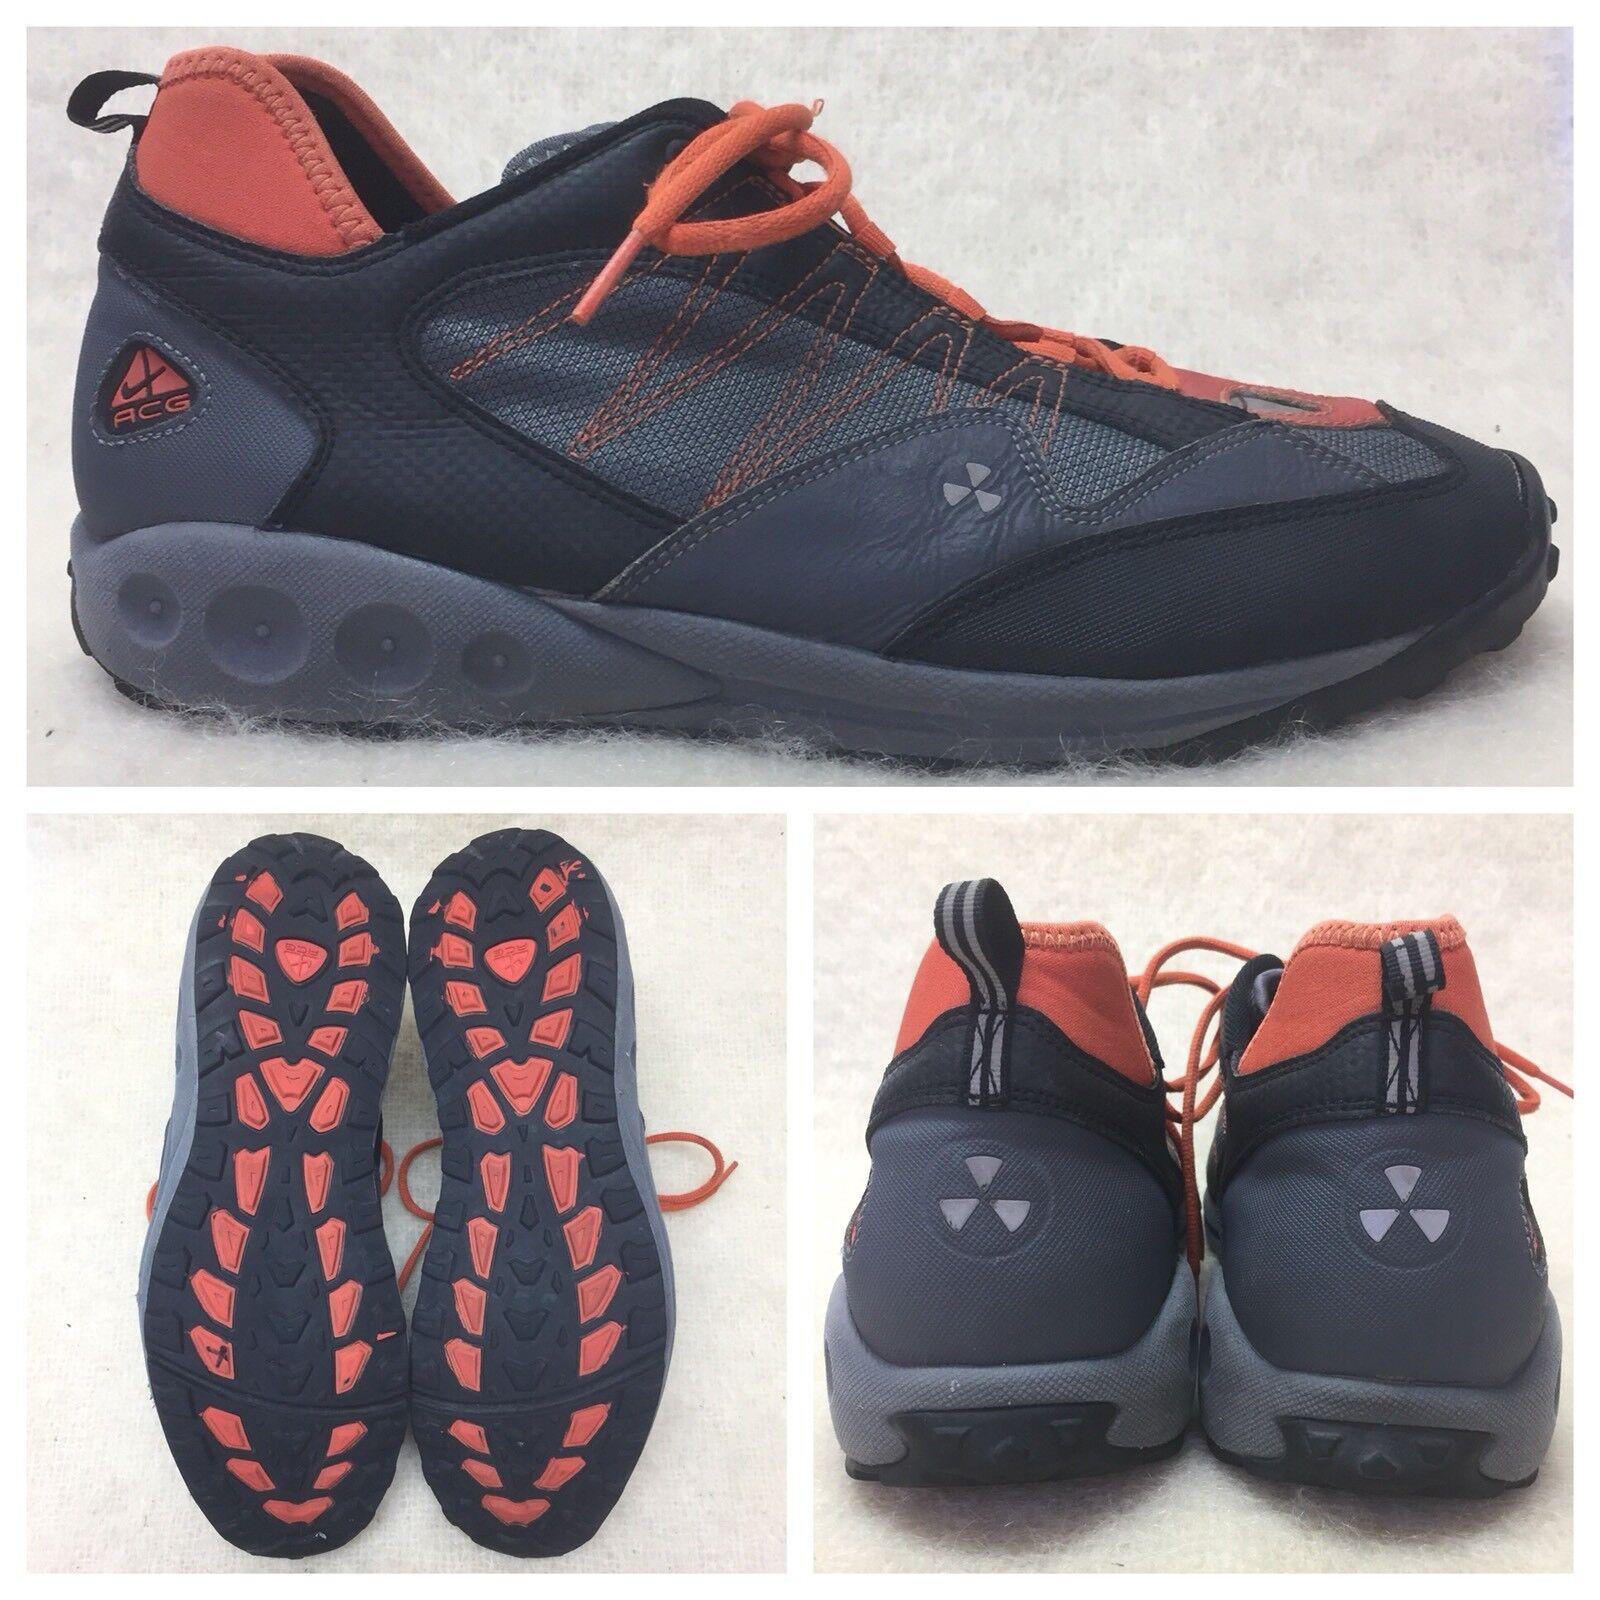 Nike ACG 990406 052 Mens Shoes Men 13 US Gray Orange